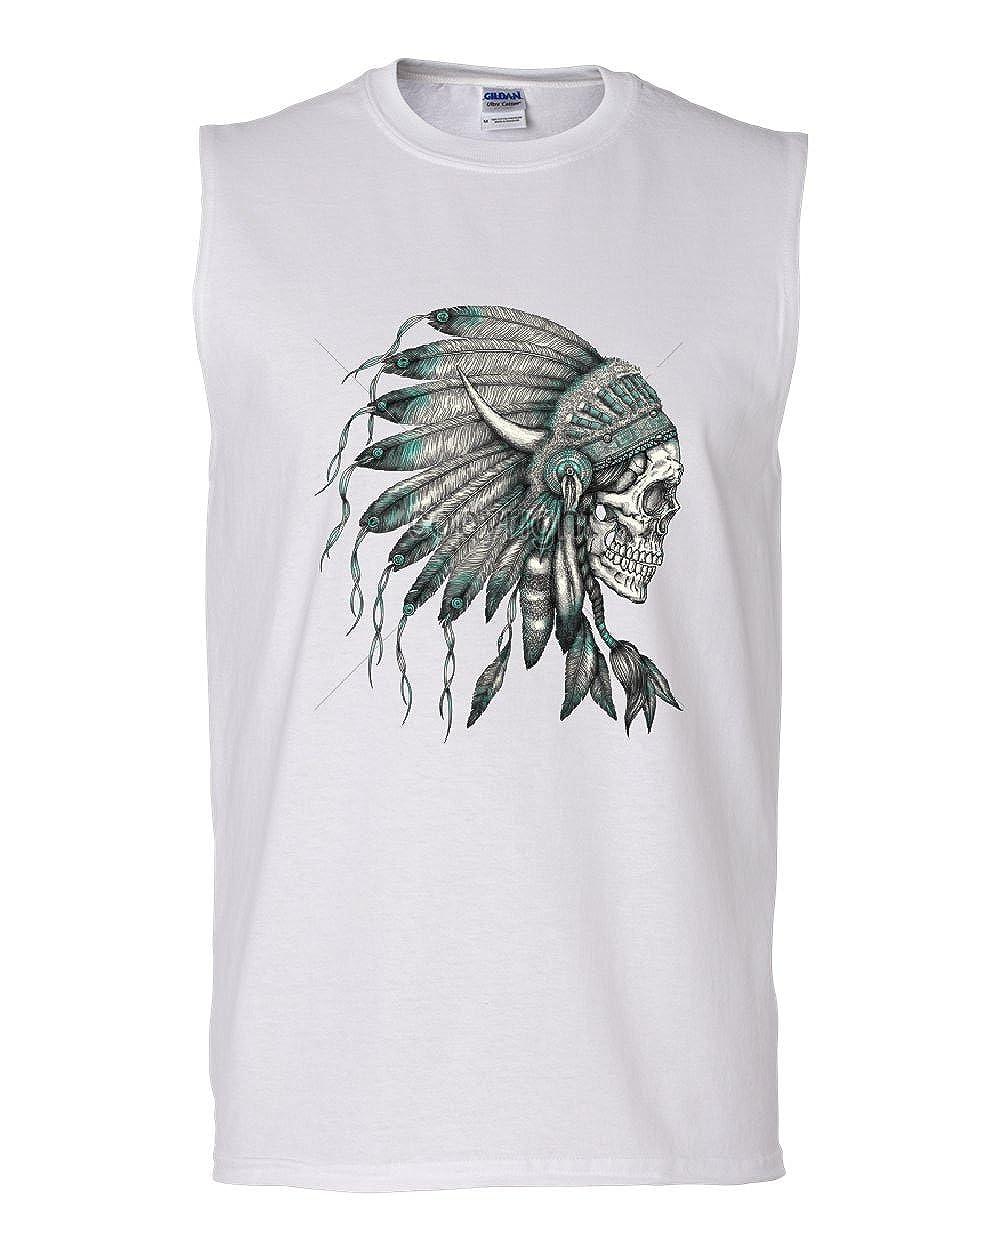 Indian Headdress Skull Muscle Shirt Native American Tribe